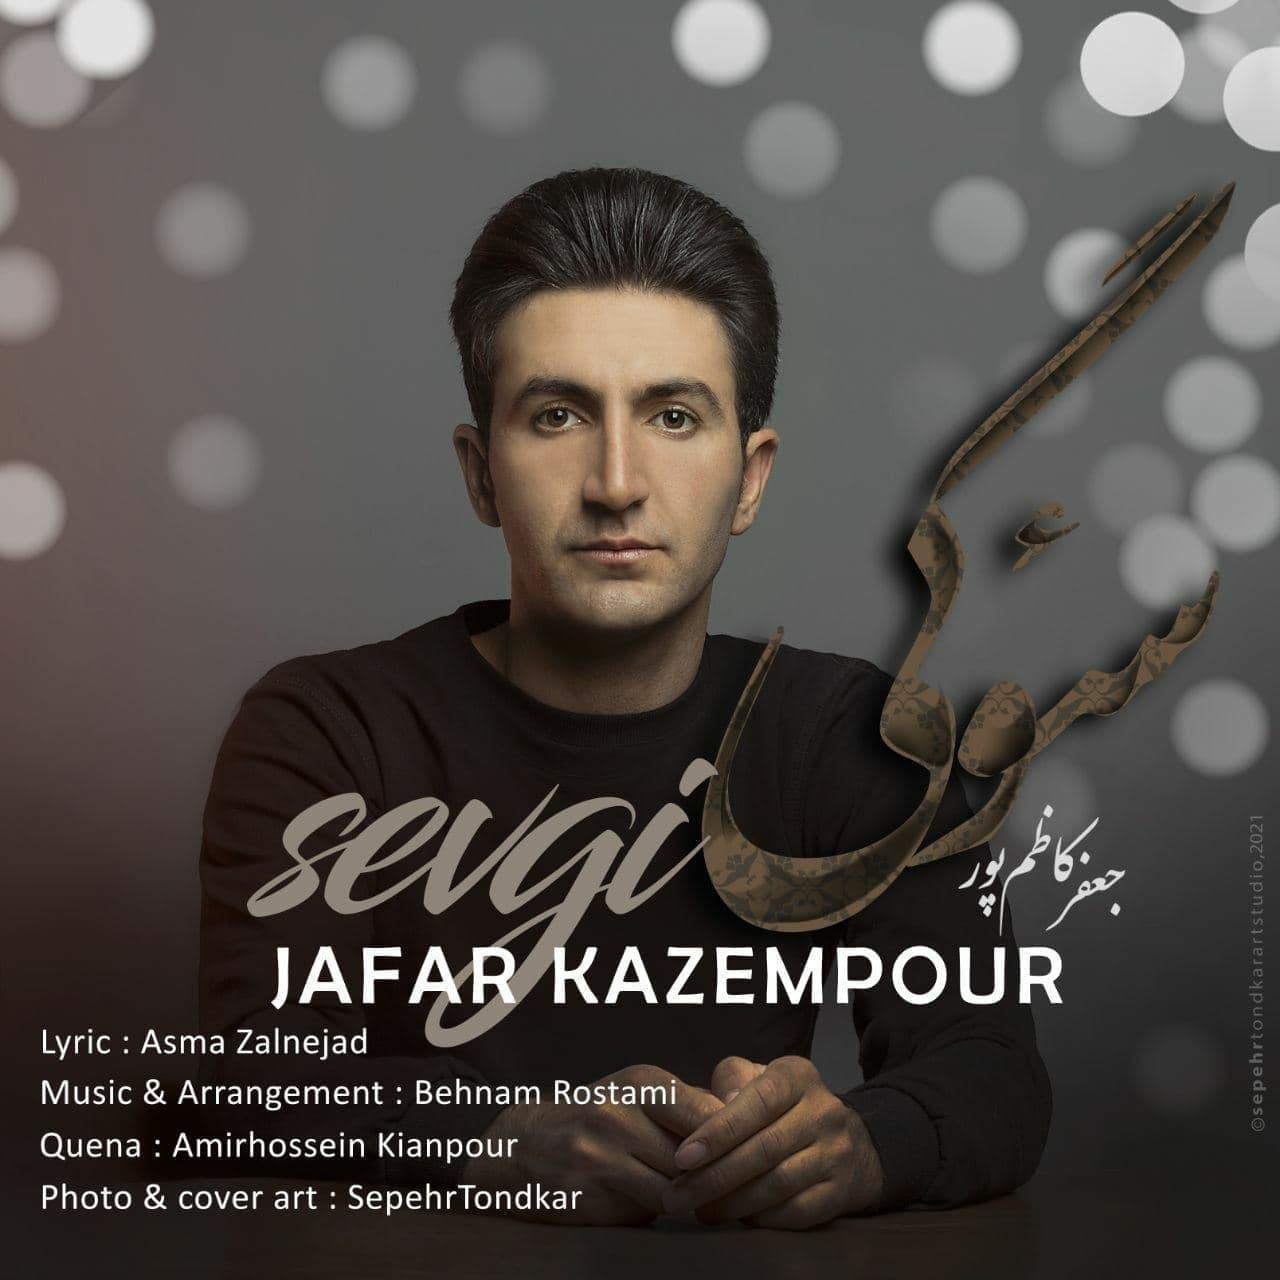 https://s18.picofile.com/file/8437196584/08Jafar_Kazempour_Sevgi.jpg